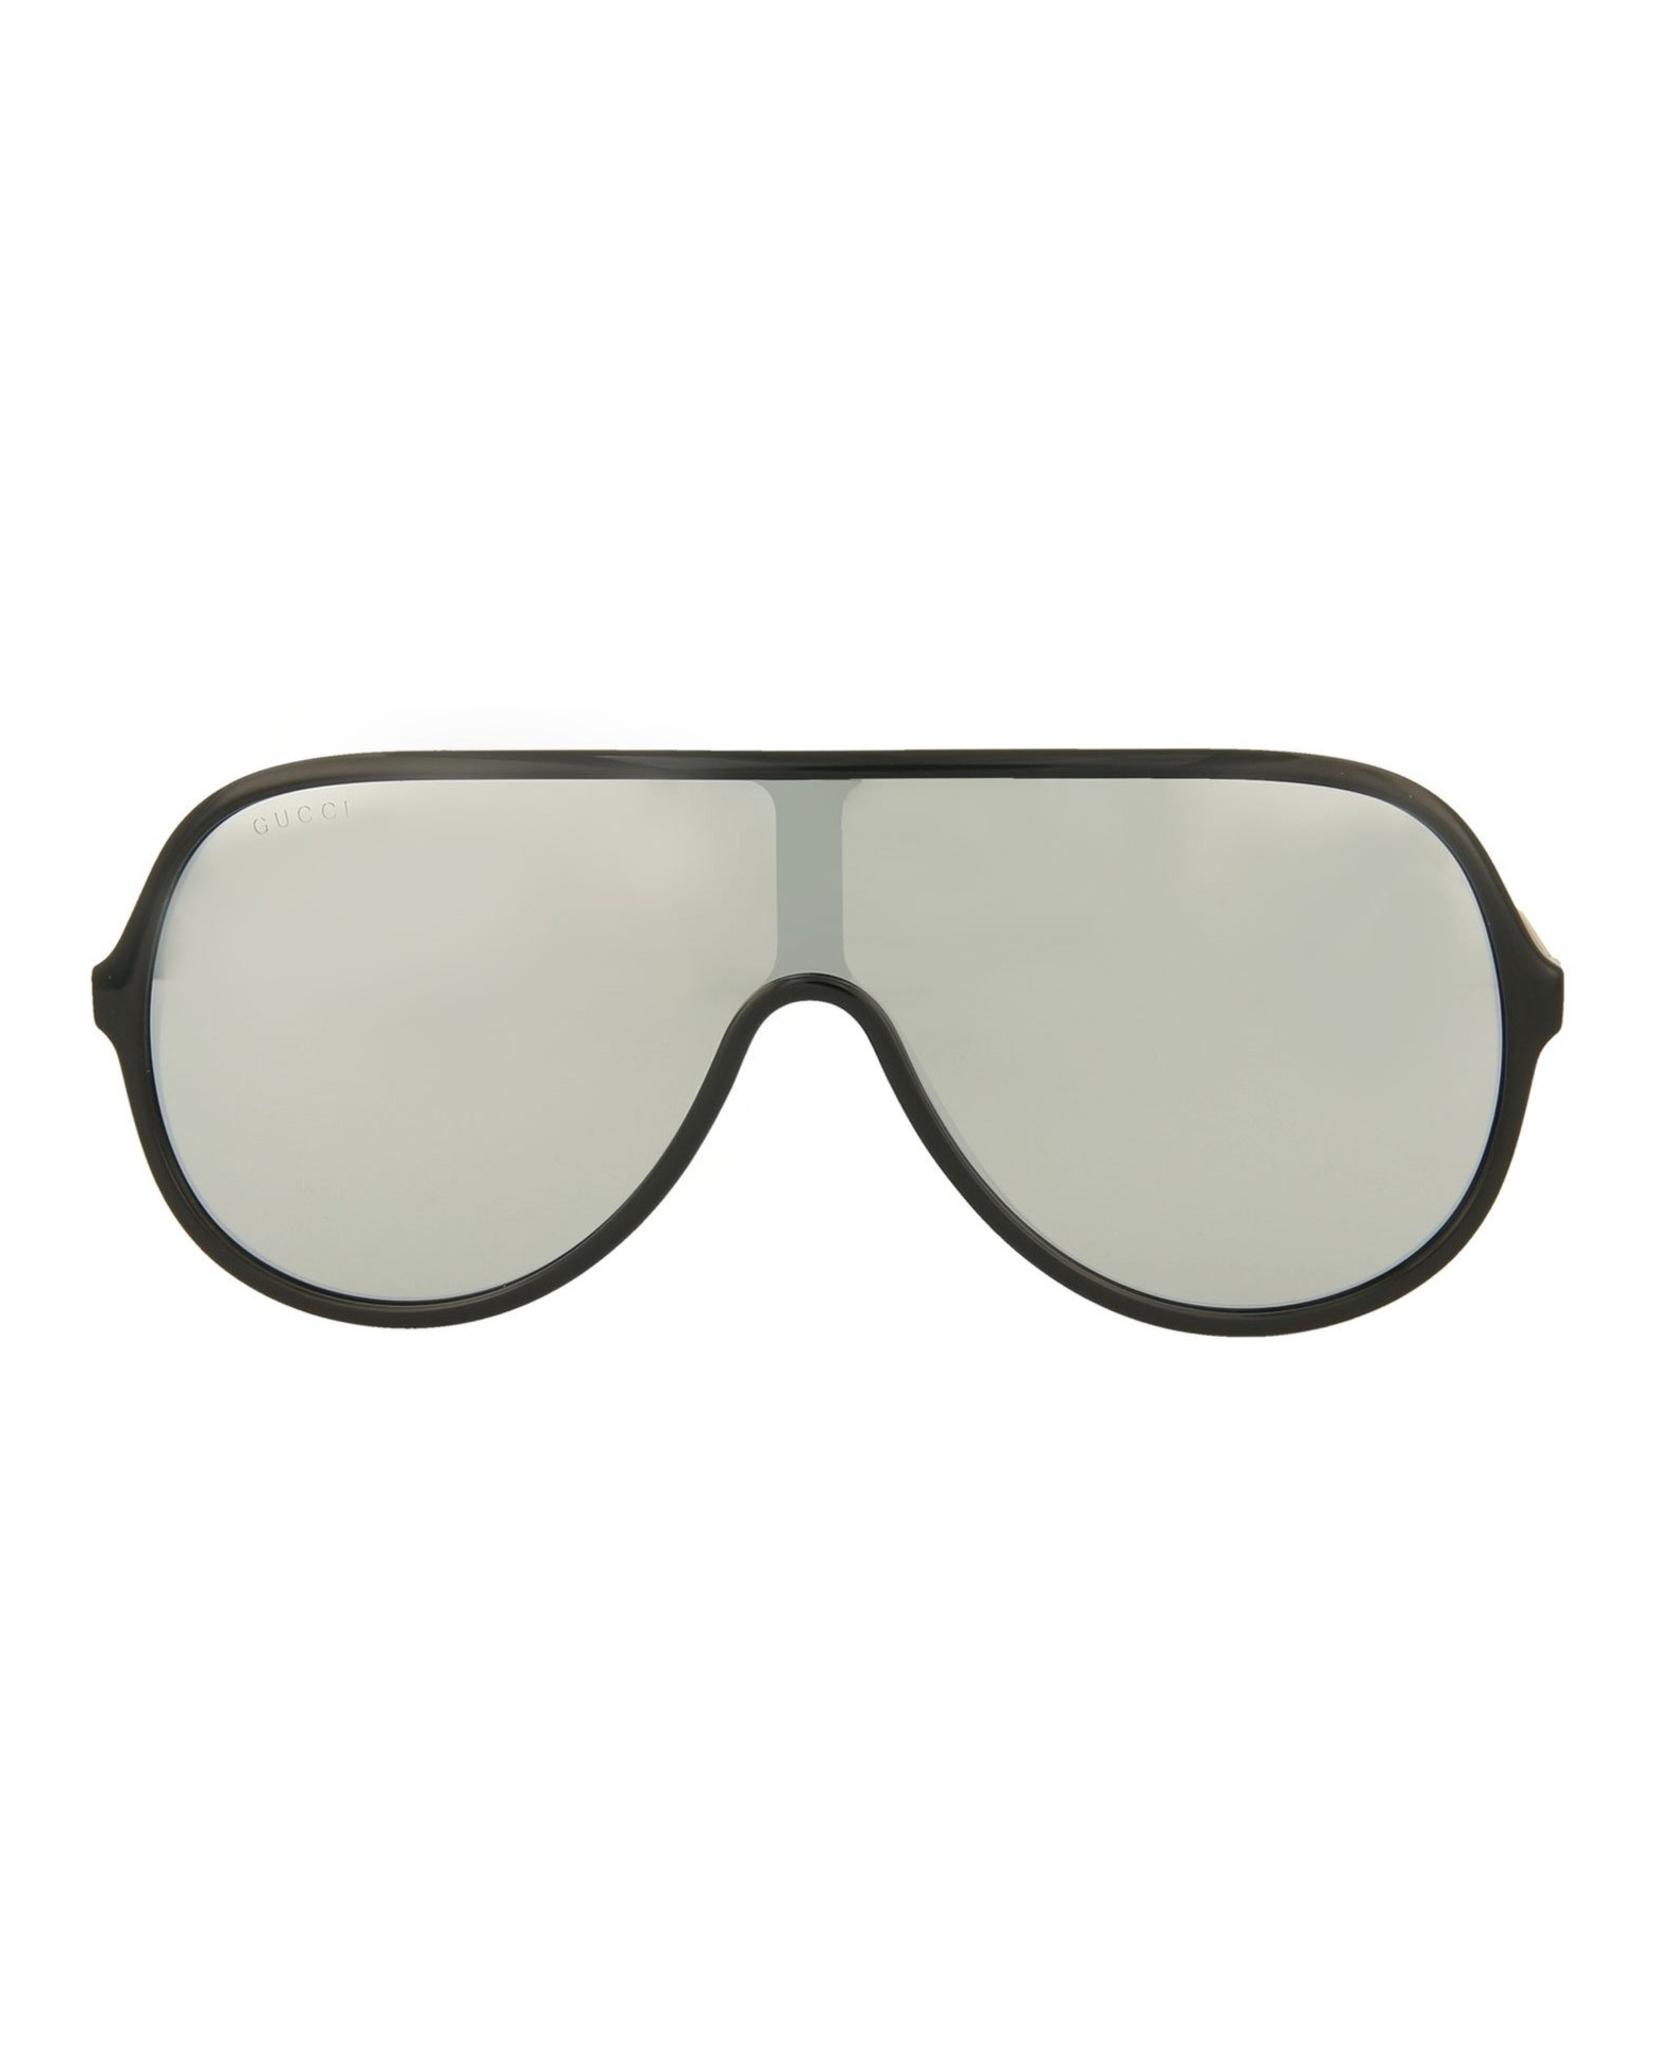 219417d07aa1a Gucci Unisex Square Rectangle Sunglasses GG0199S-30001806-002 ...